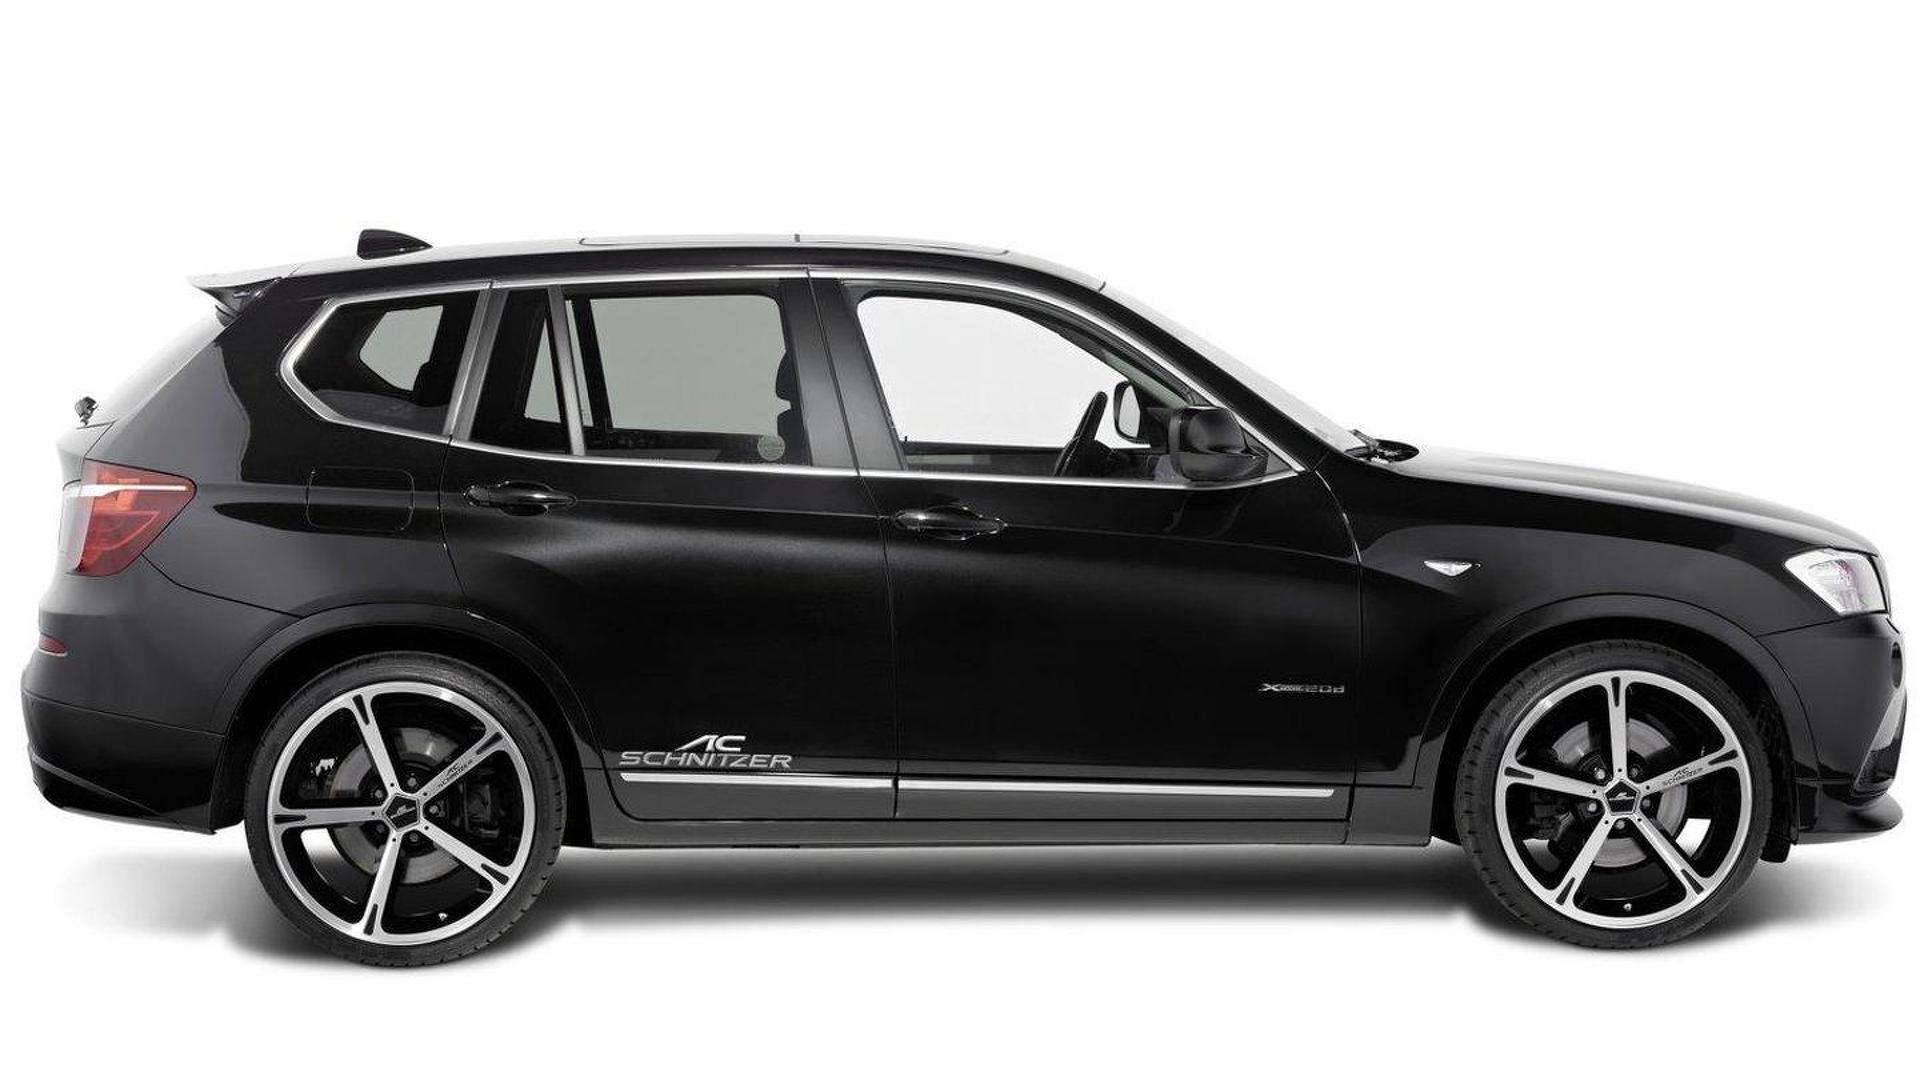 2011 BMW X3 F25 By AC Schnitzer Video